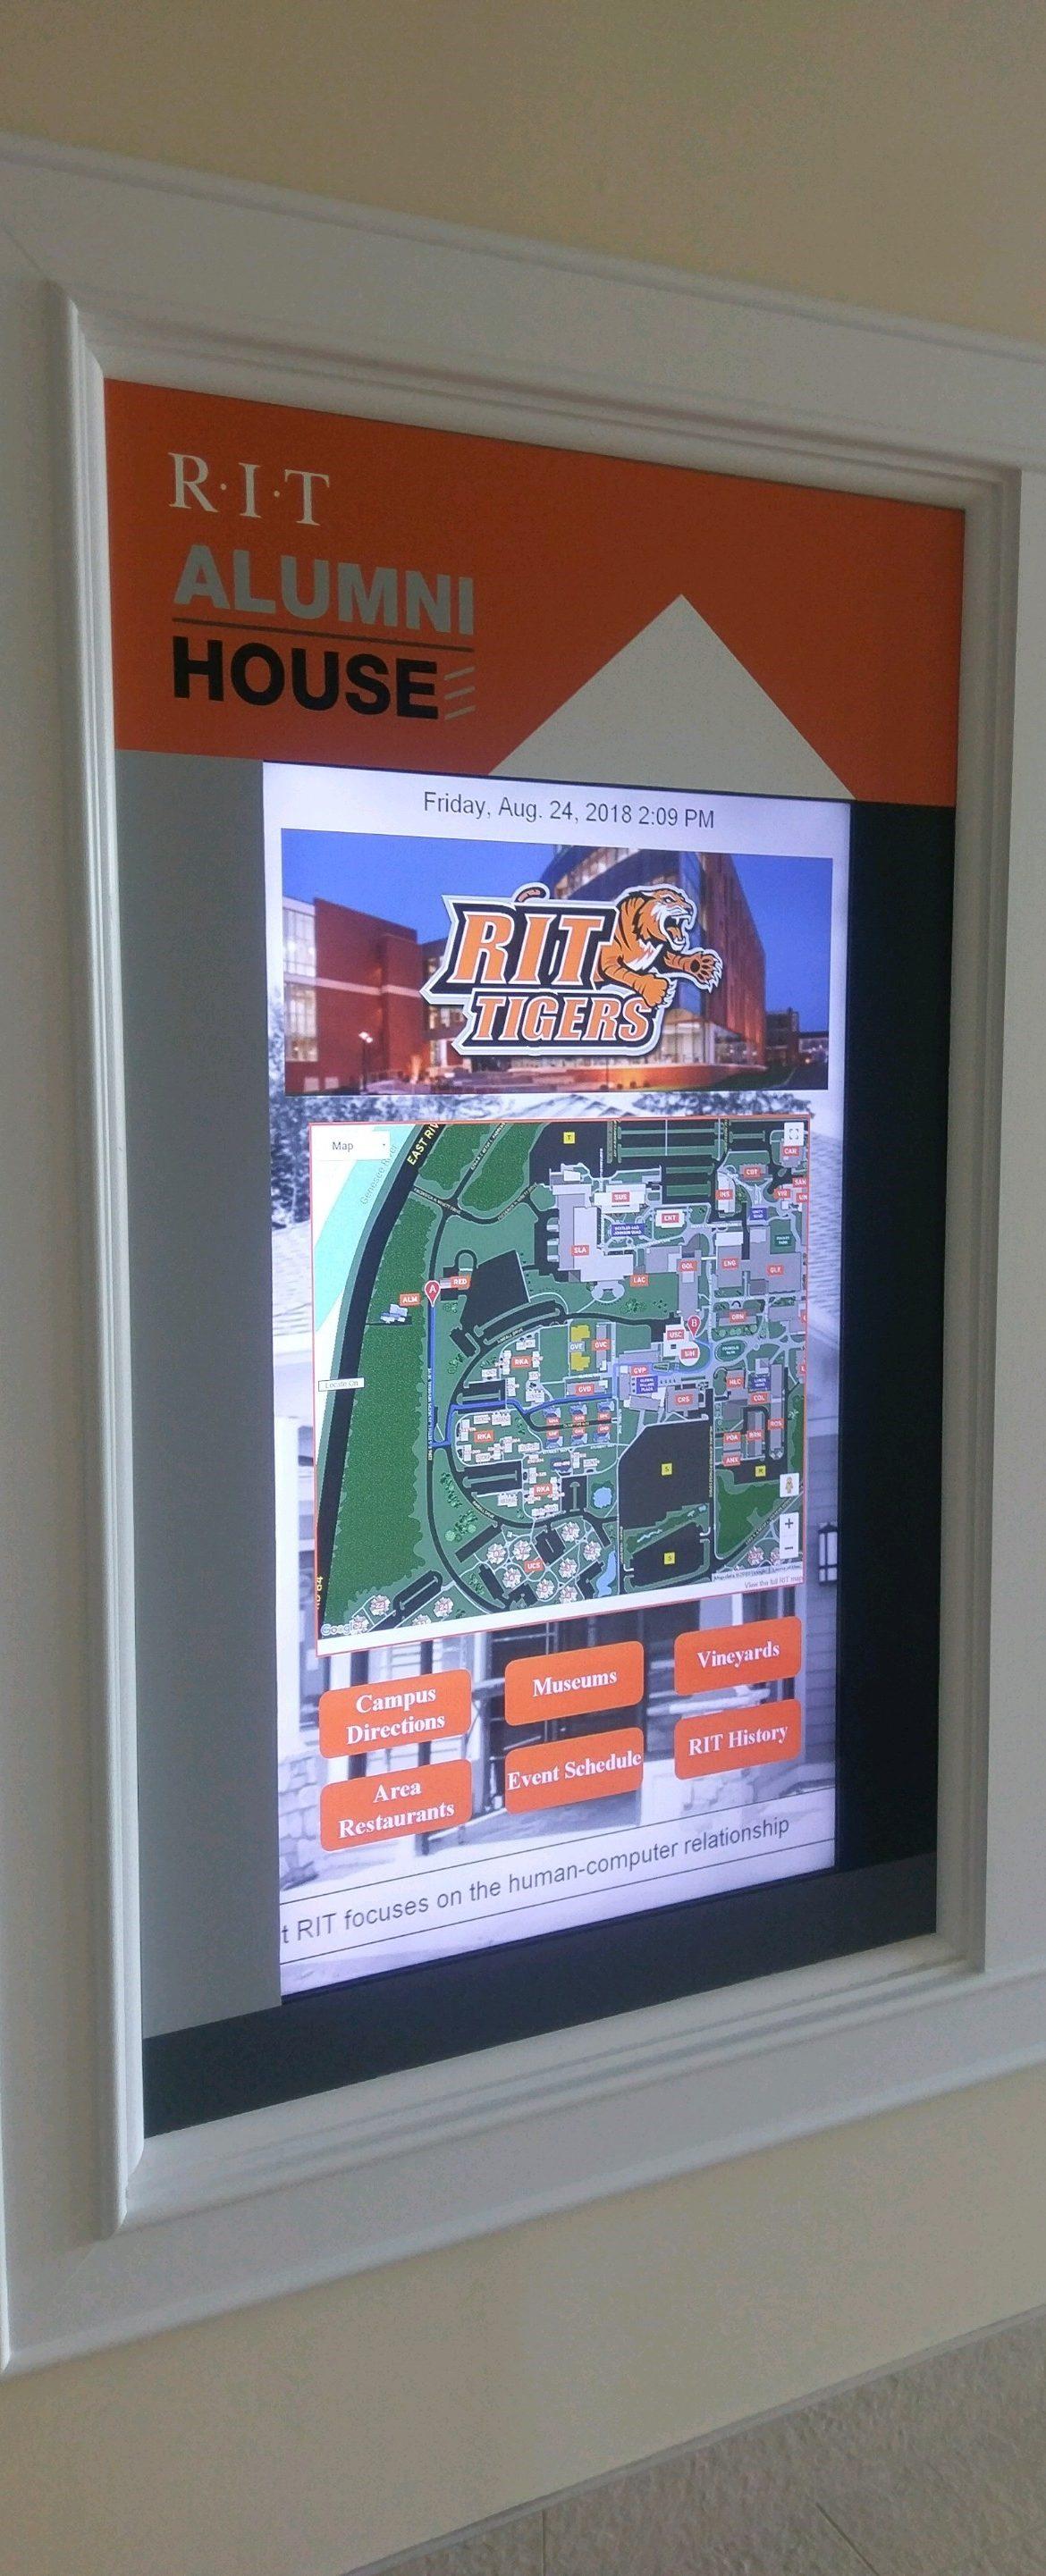 window touchscreen, window touch screen, touchscreen digital signage, campus digital signage